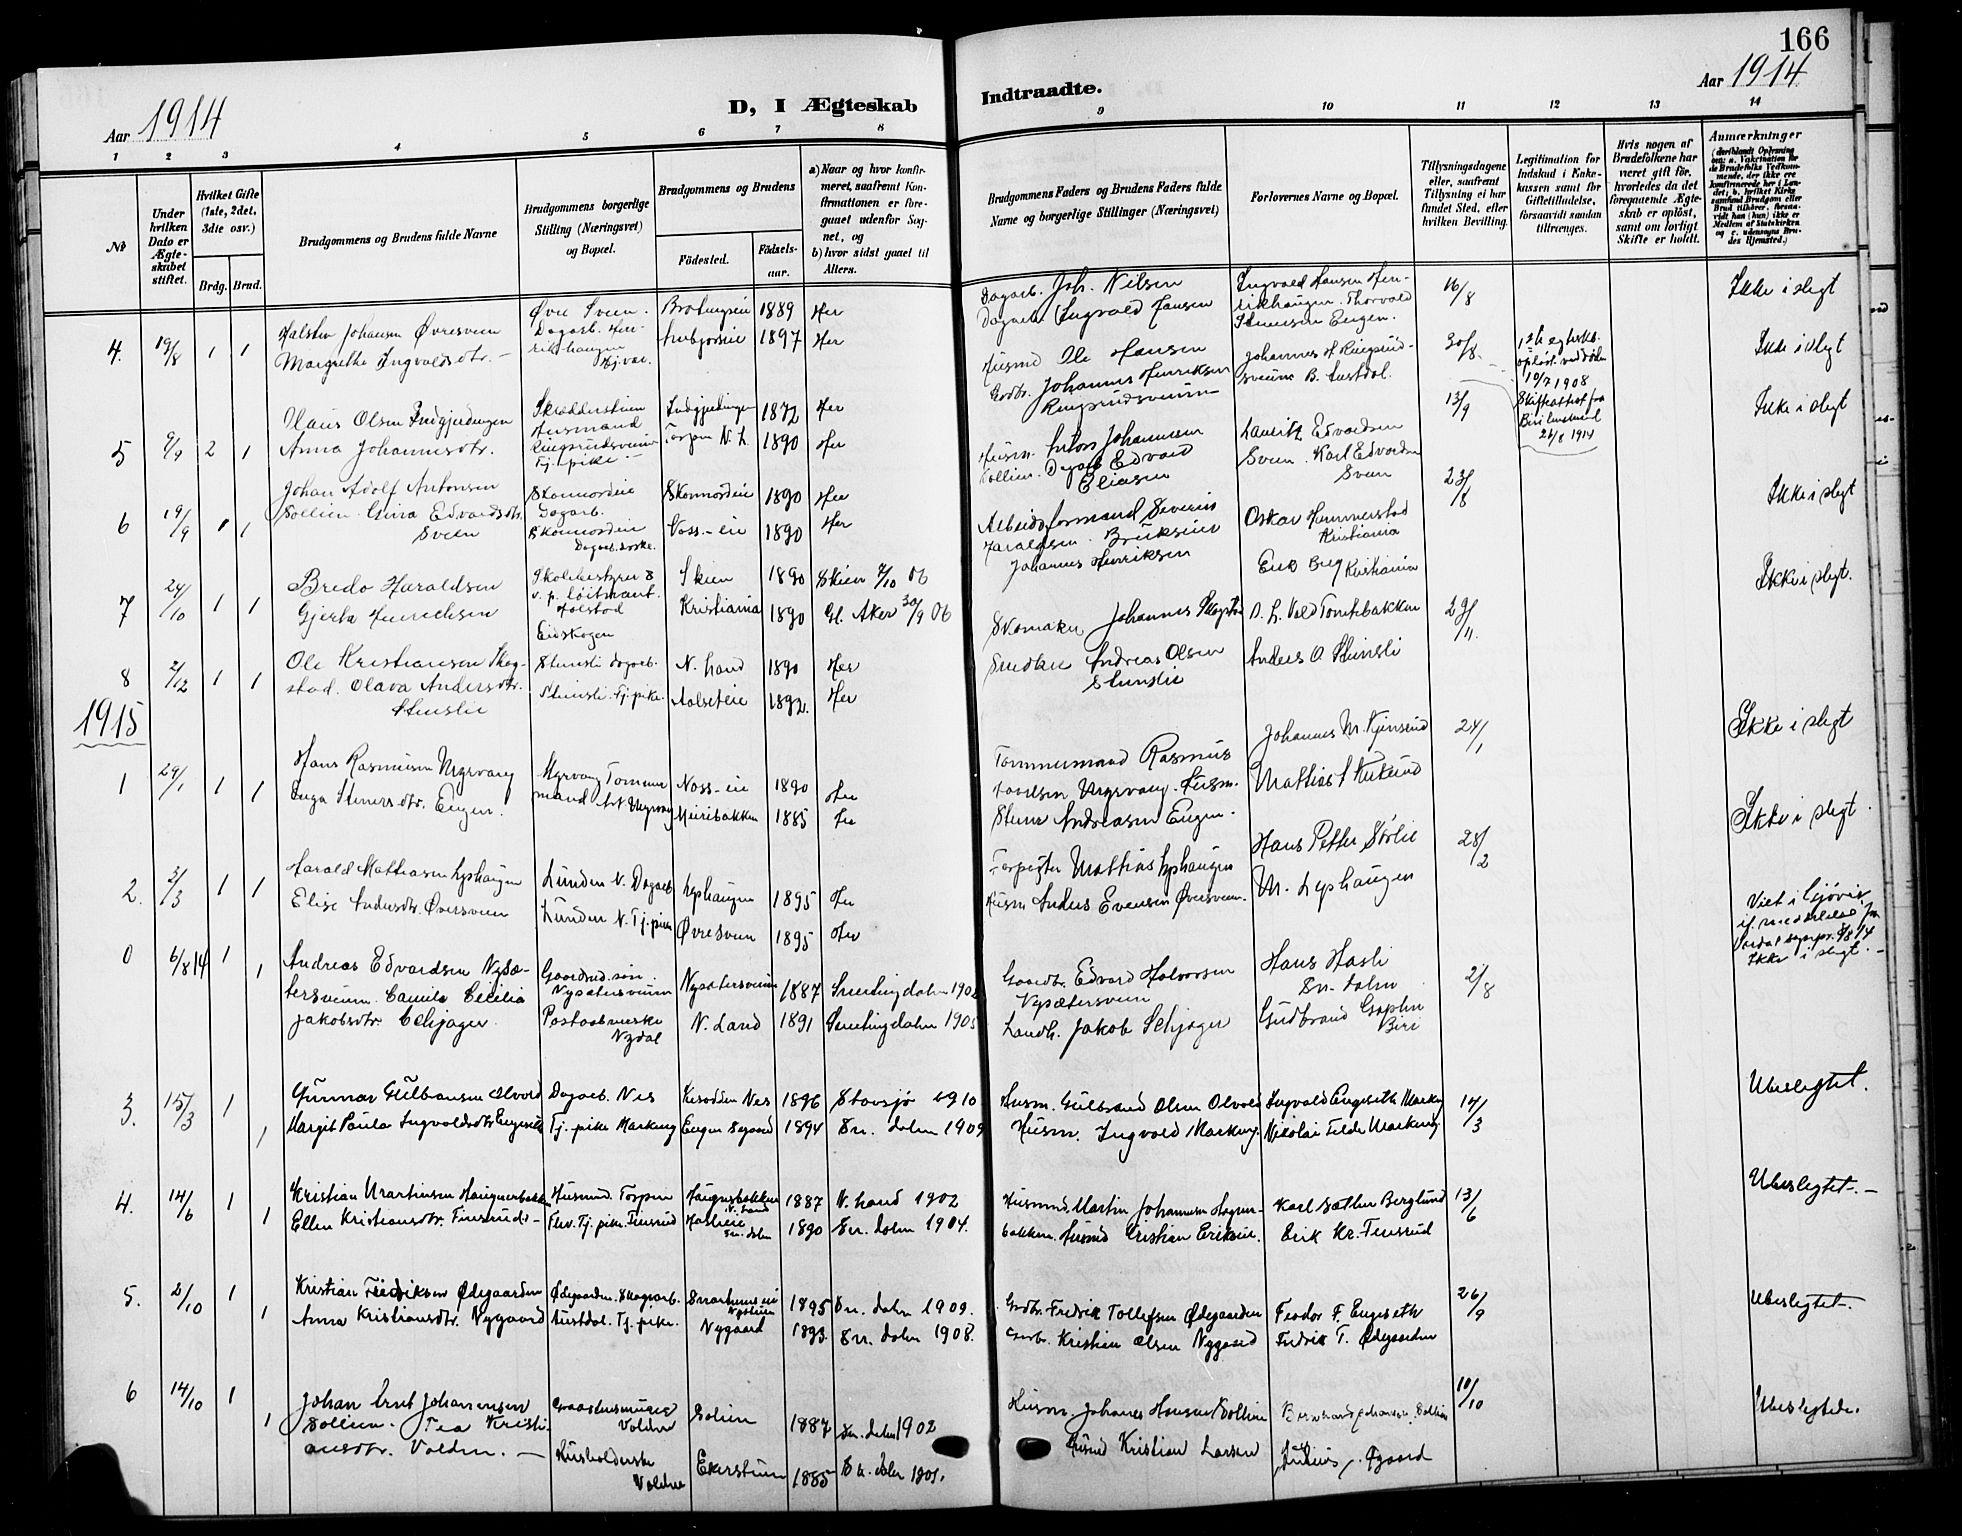 SAH, Biri prestekontor, Klokkerbok nr. 5, 1906-1919, s. 166